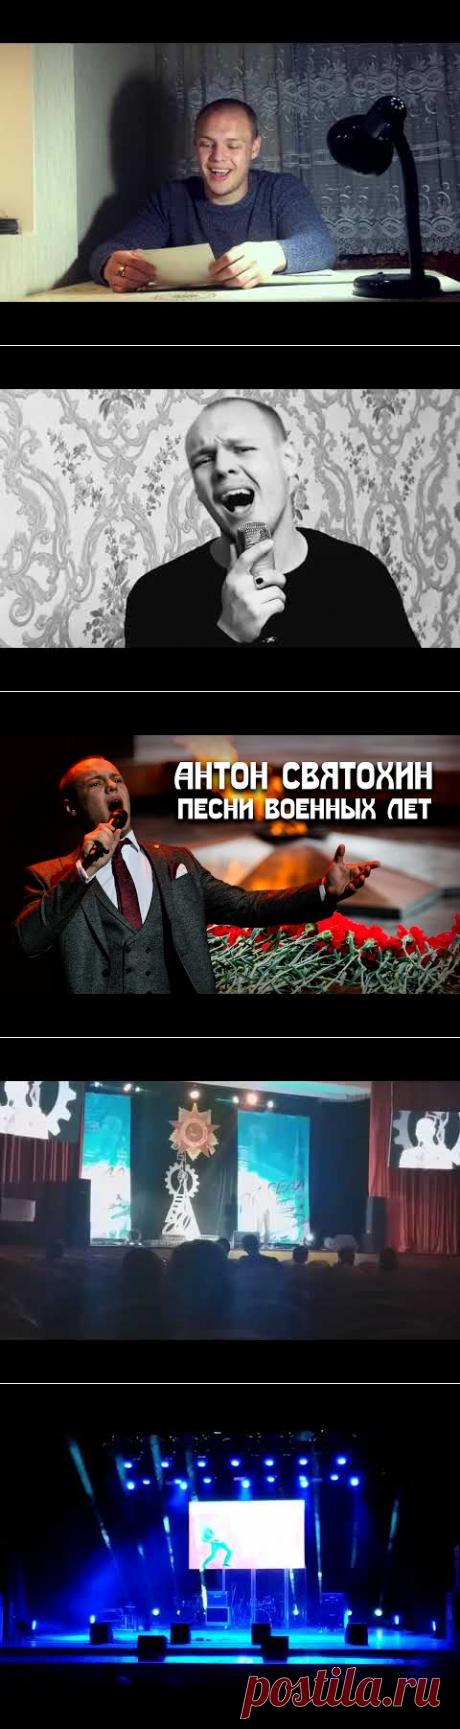 Антон Святохин - YouTube